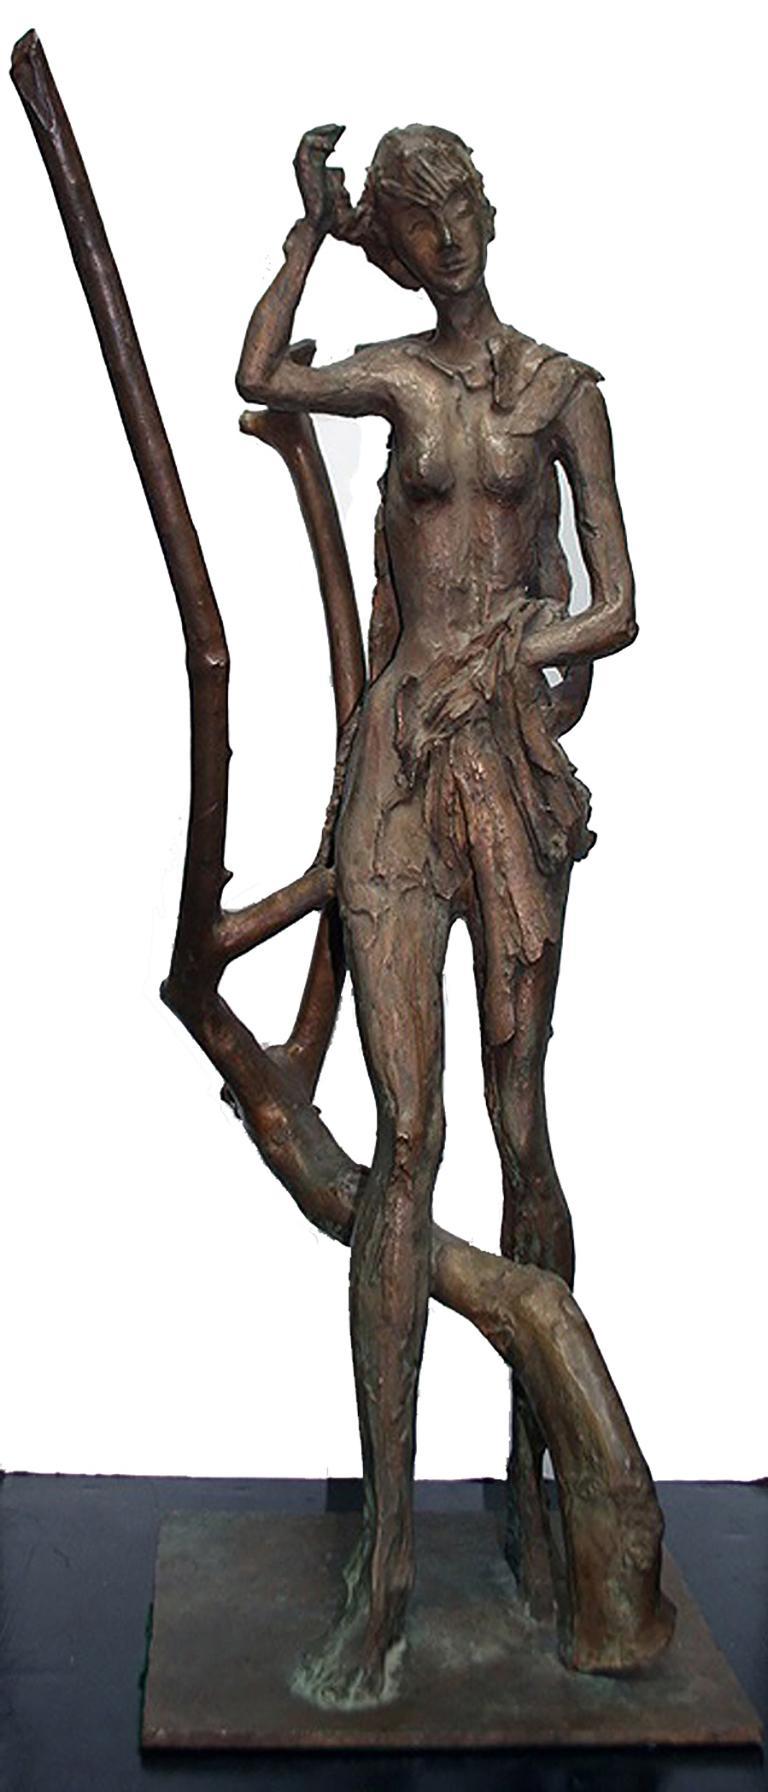 Nicola Simbari Nude Sculpture - UNTITLED (NUDE)